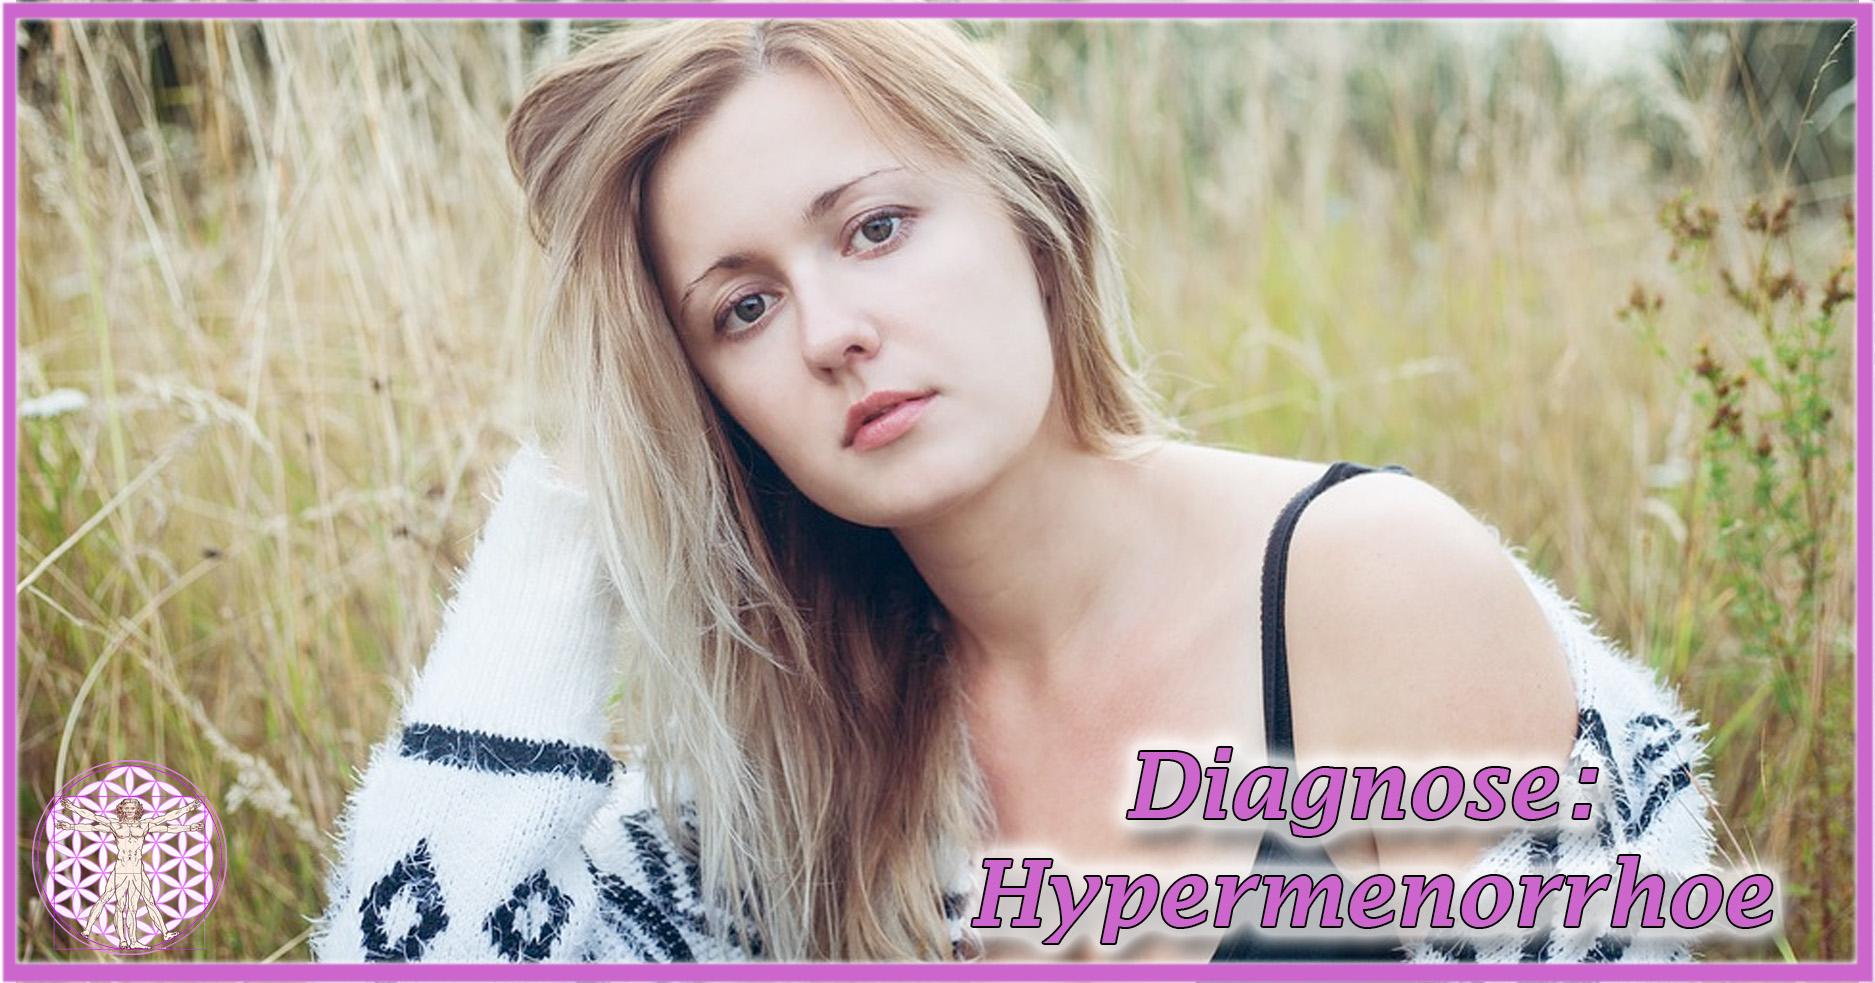 Hypermenorrhoe